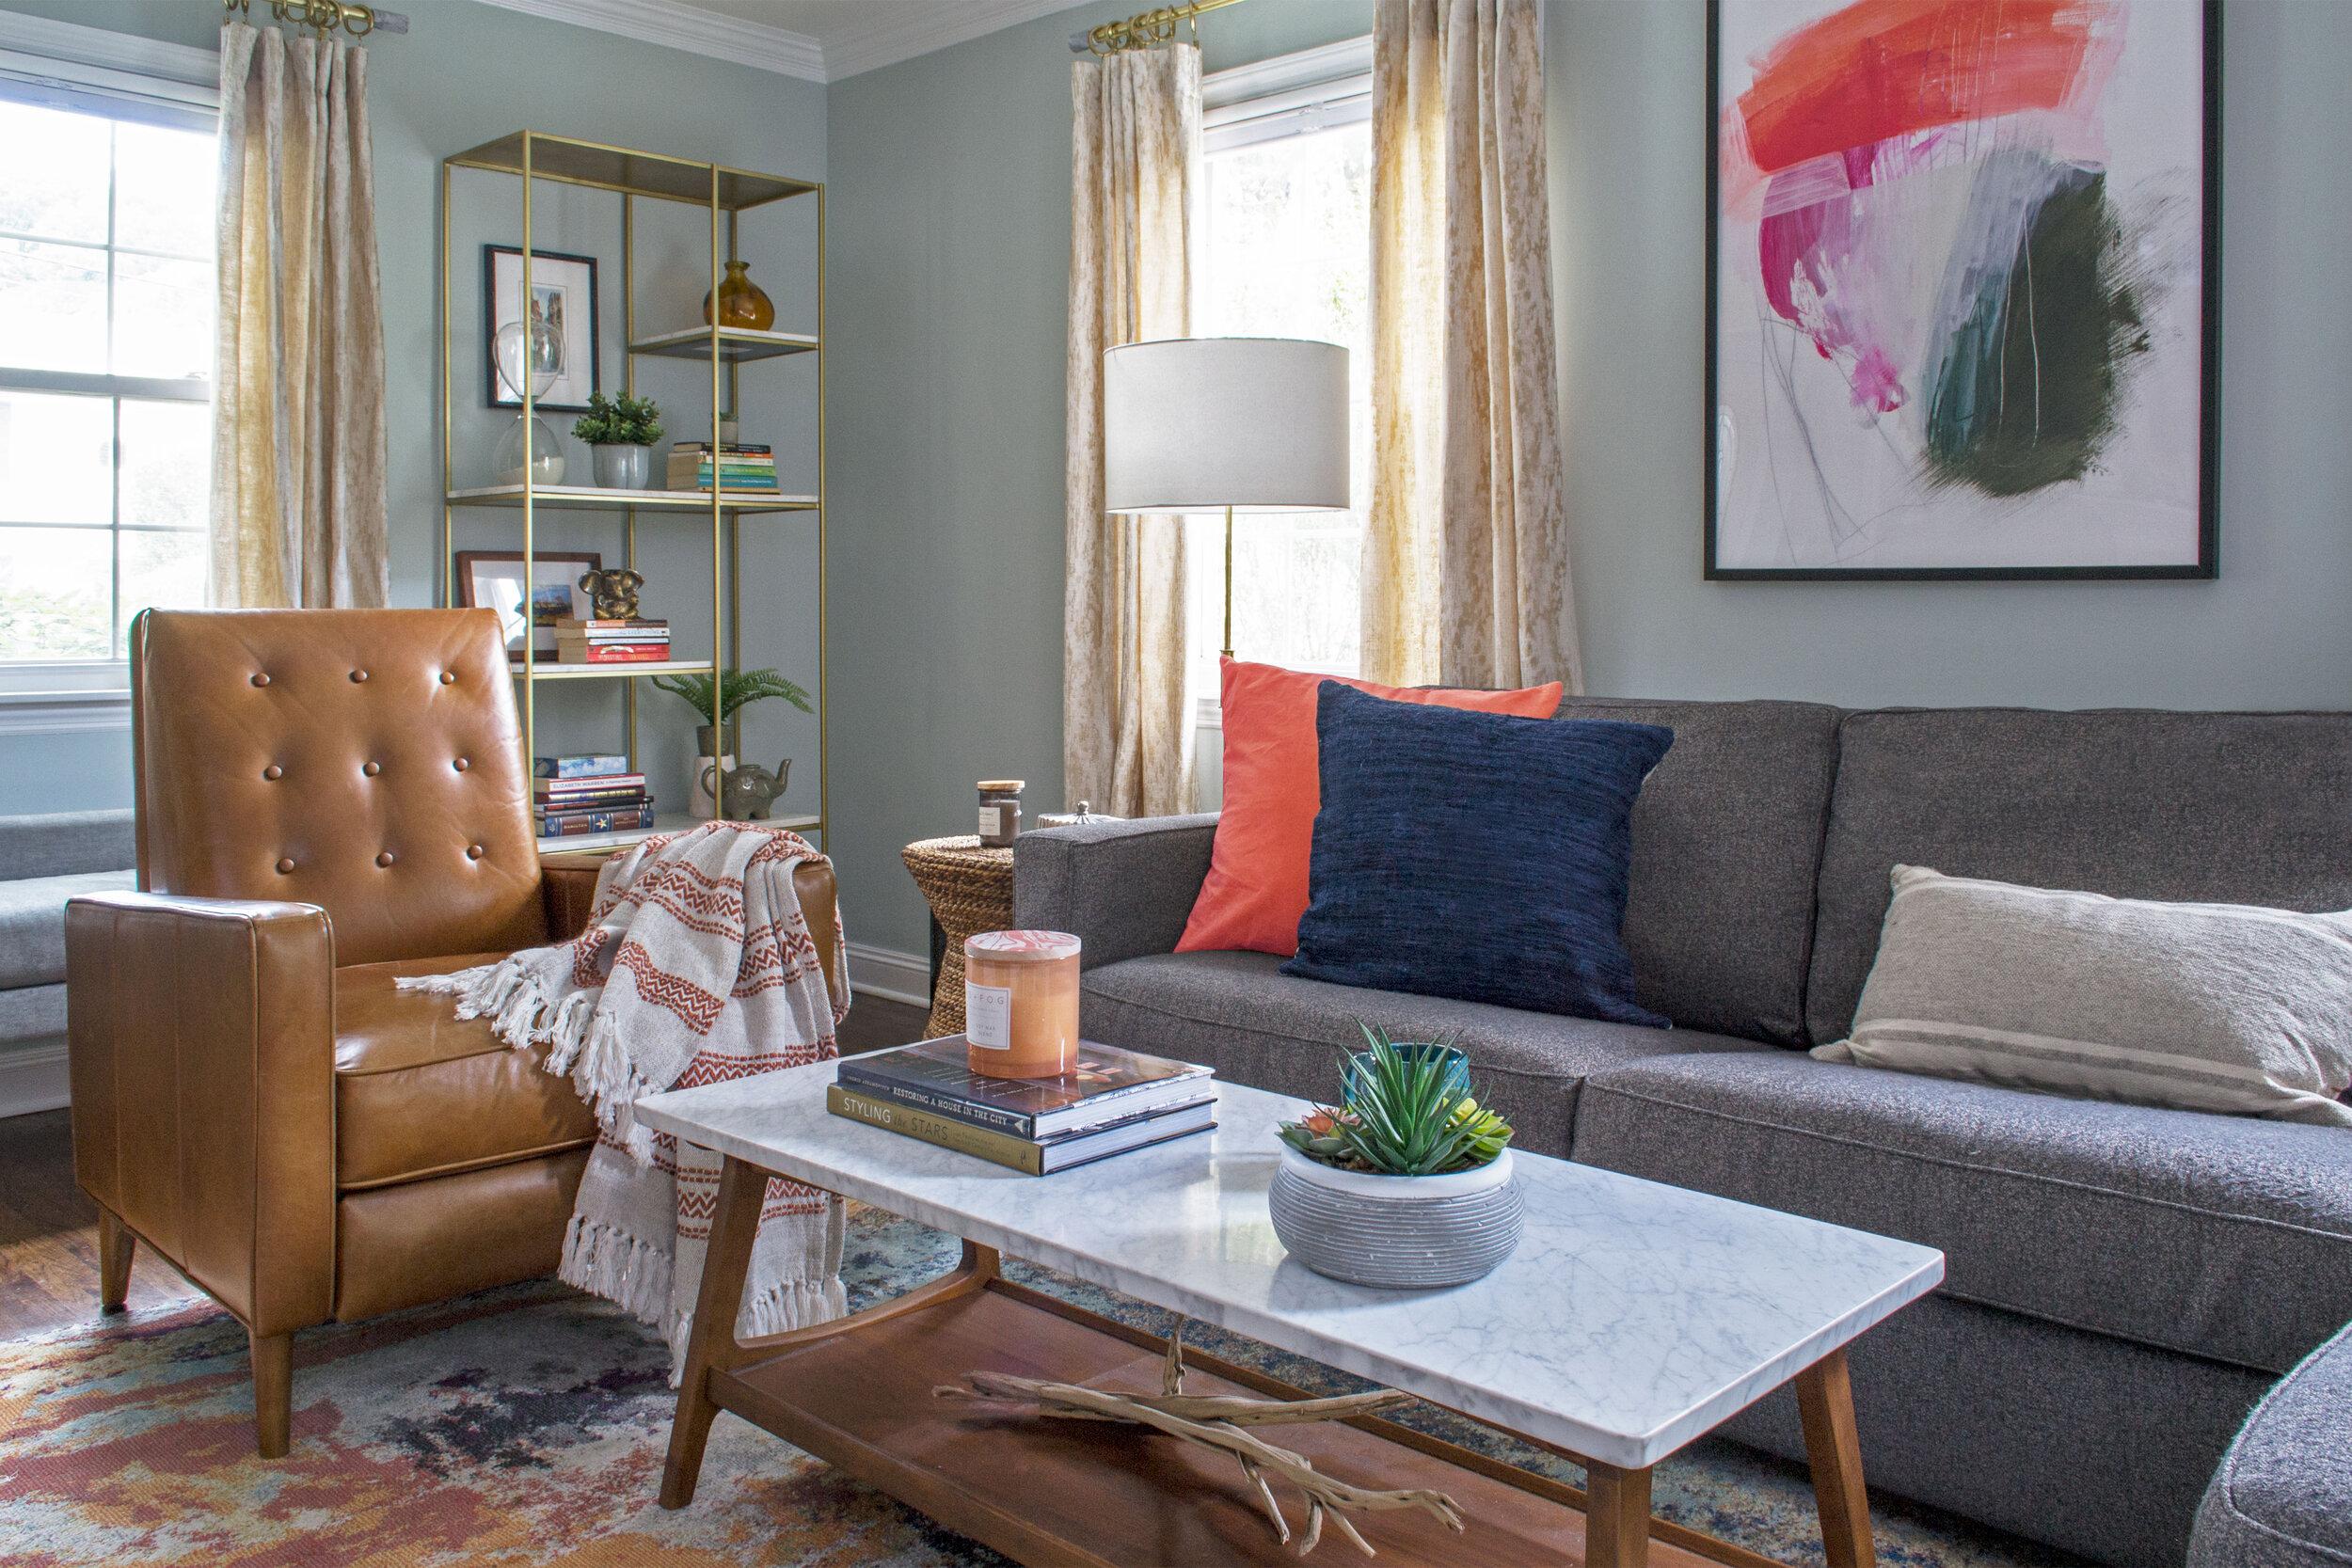 living-room-pop-of-color-tc-interiors-7.jpg